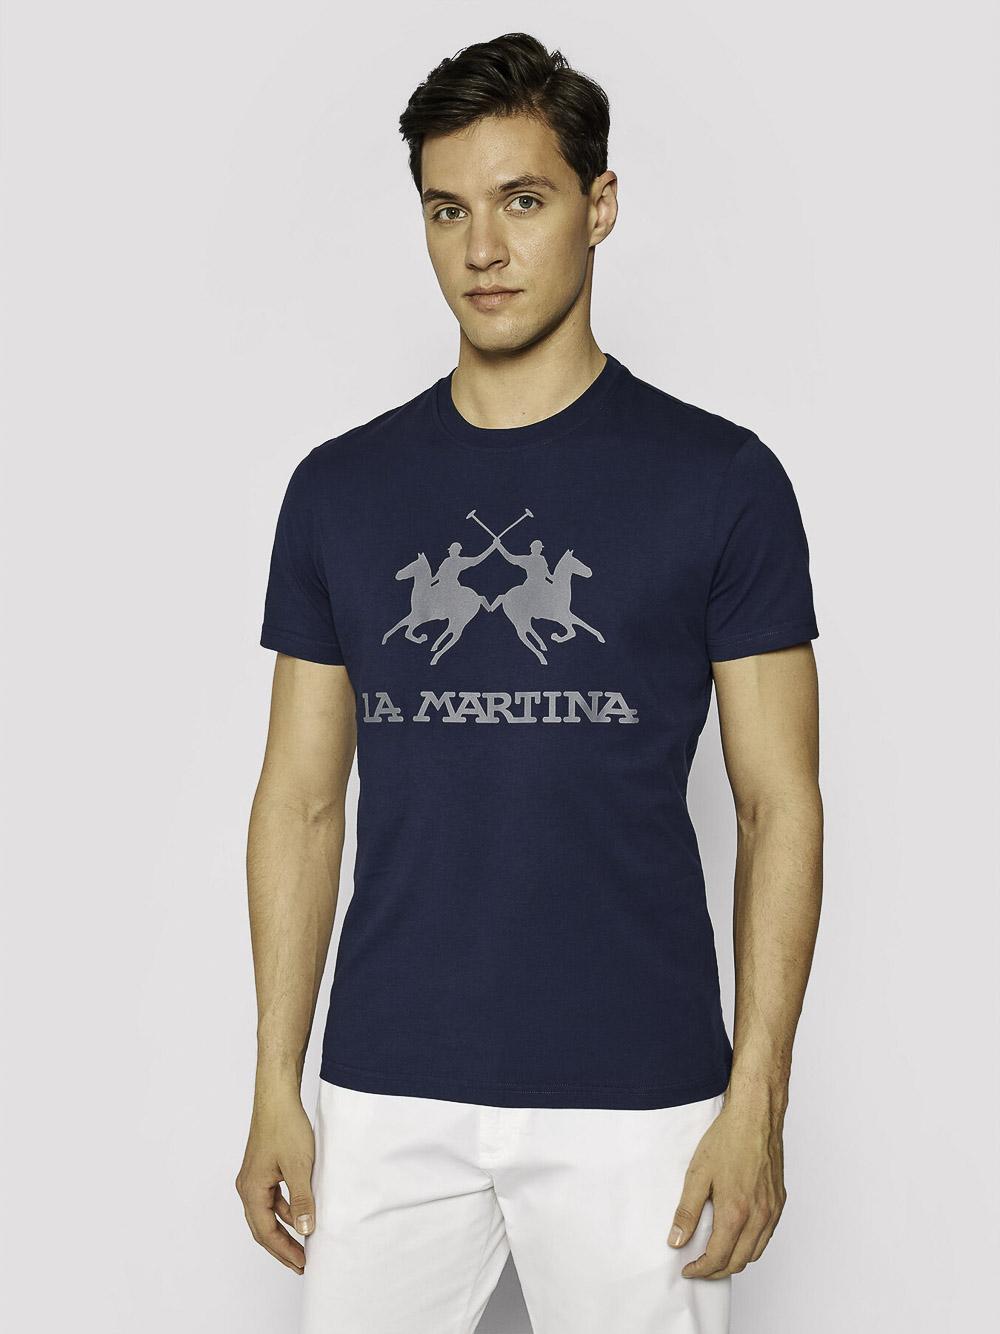 LA MARTINA Μπλούζα t-shirt 3LMCCMR01-7017 ΜΠΛΕ